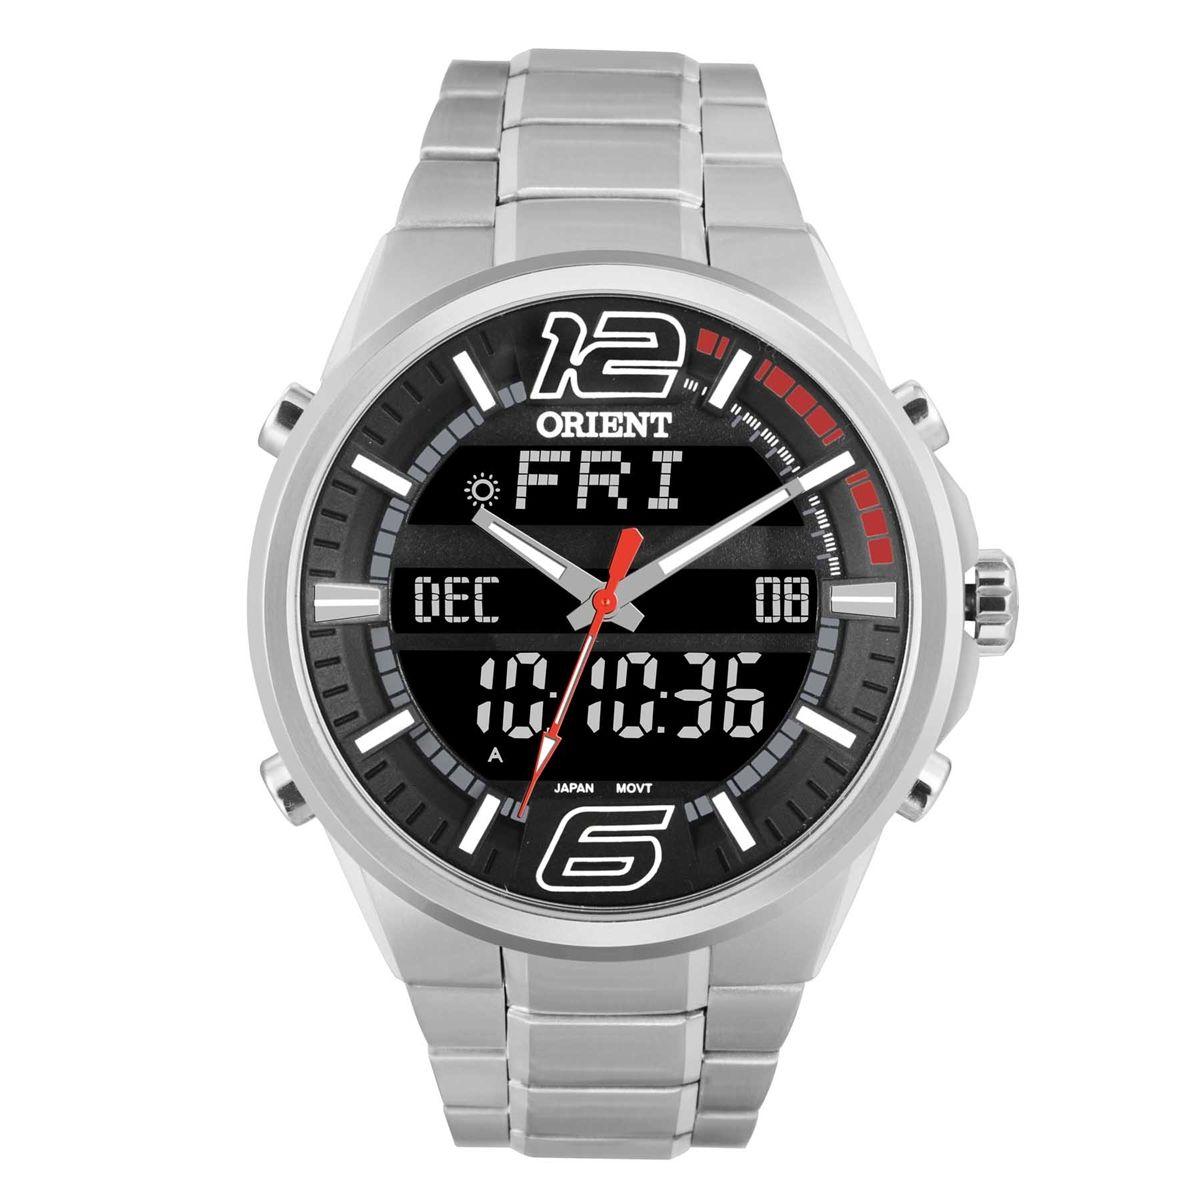 Relógio Orient Masculino Anadigi MBSSA047-PVSX